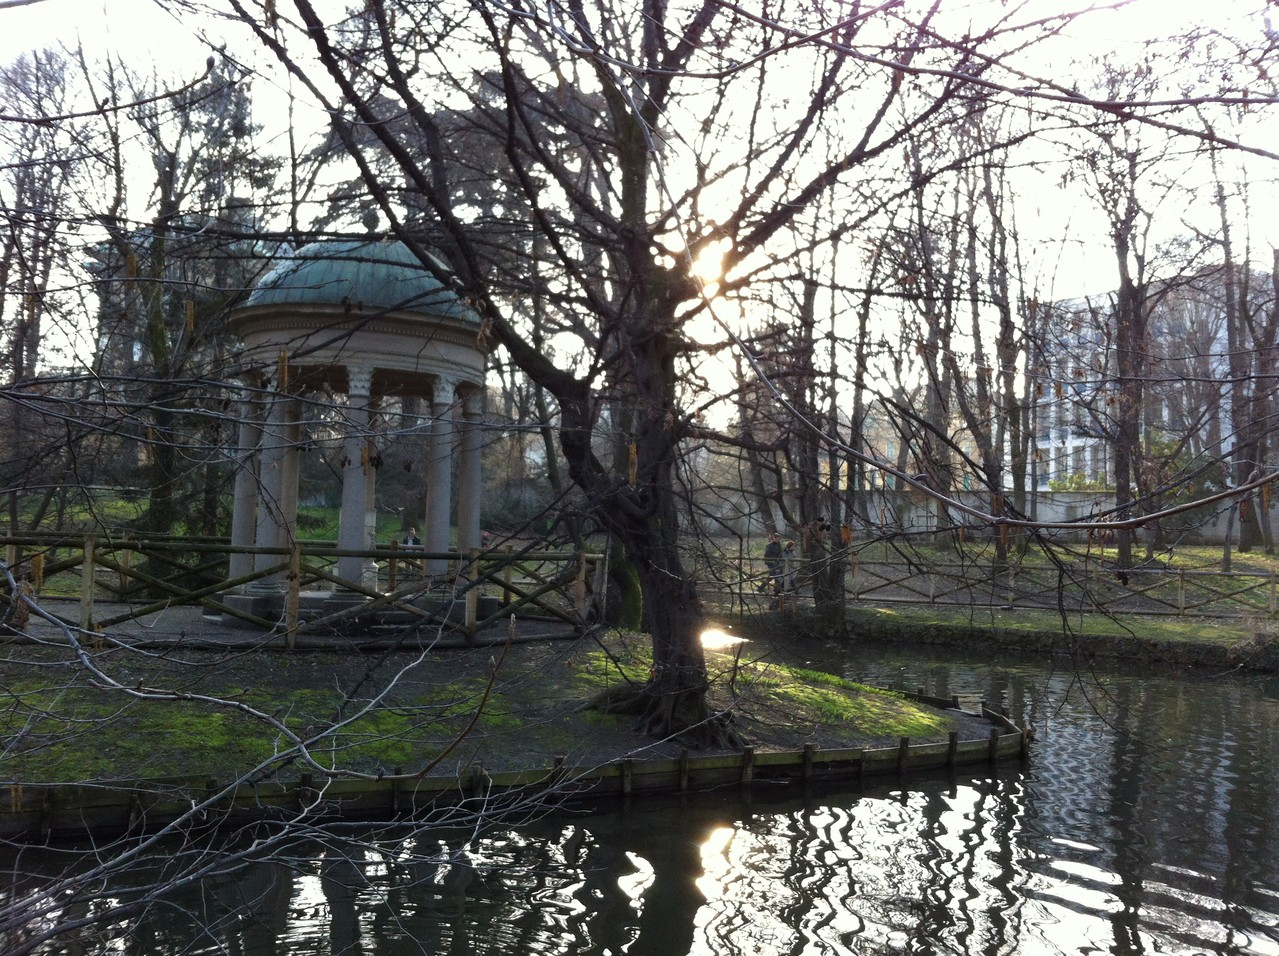 Jardin Villa Reale